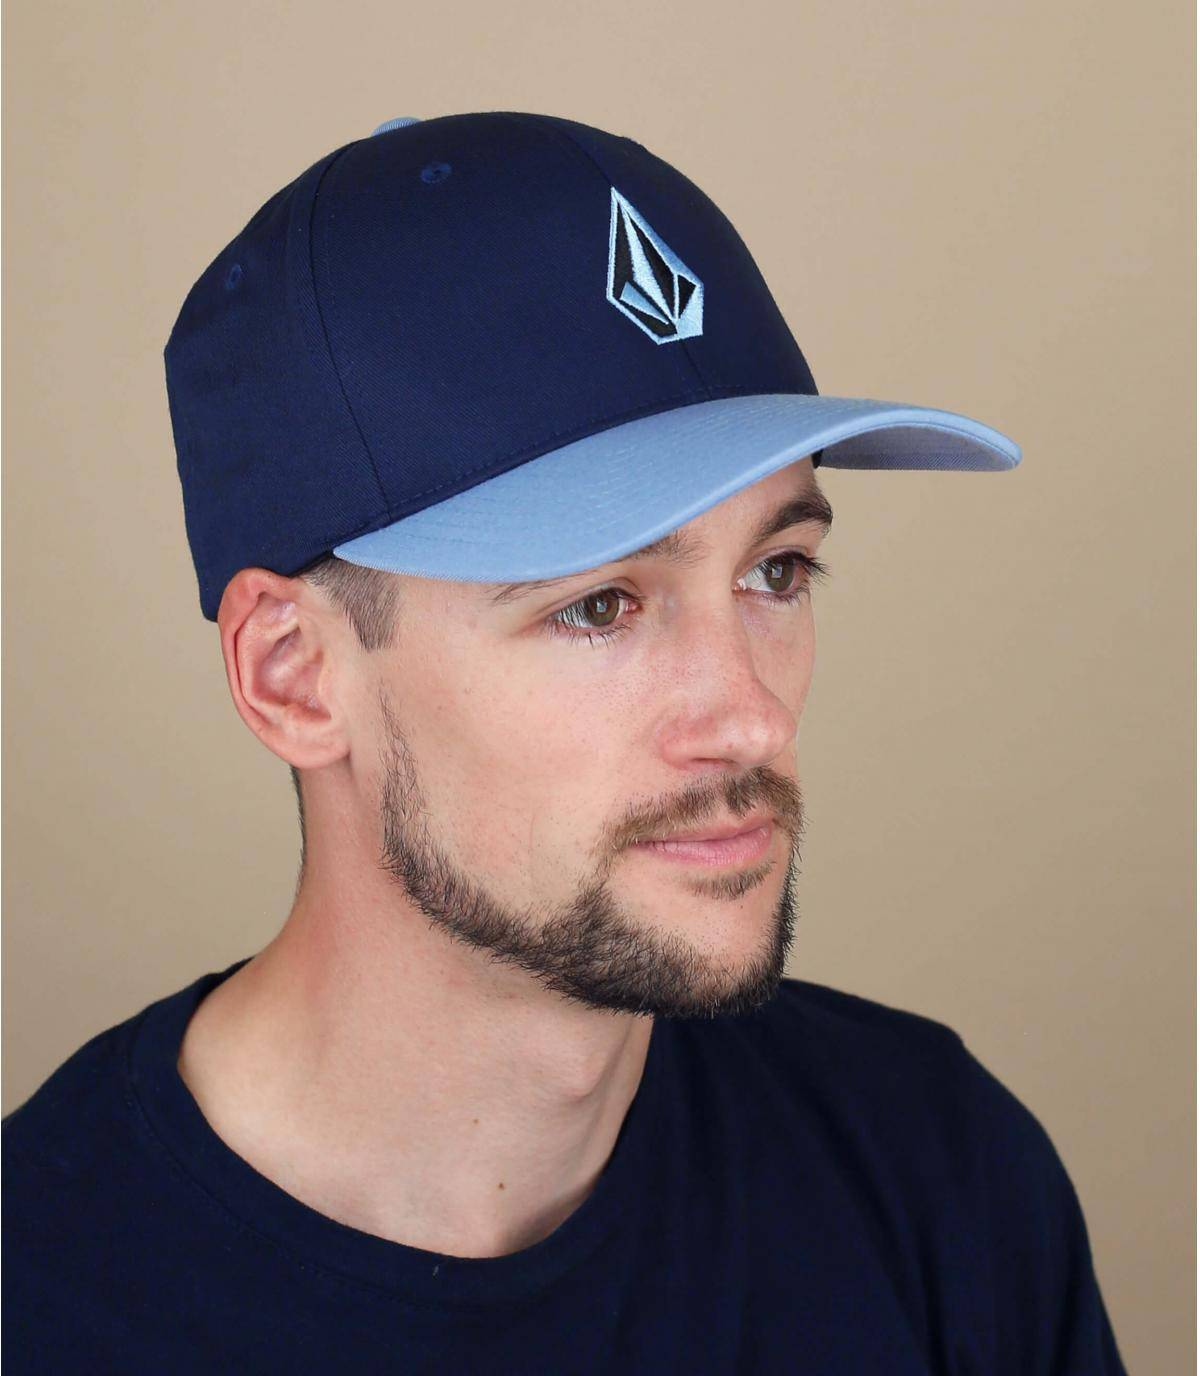 Gorra Volcom azul